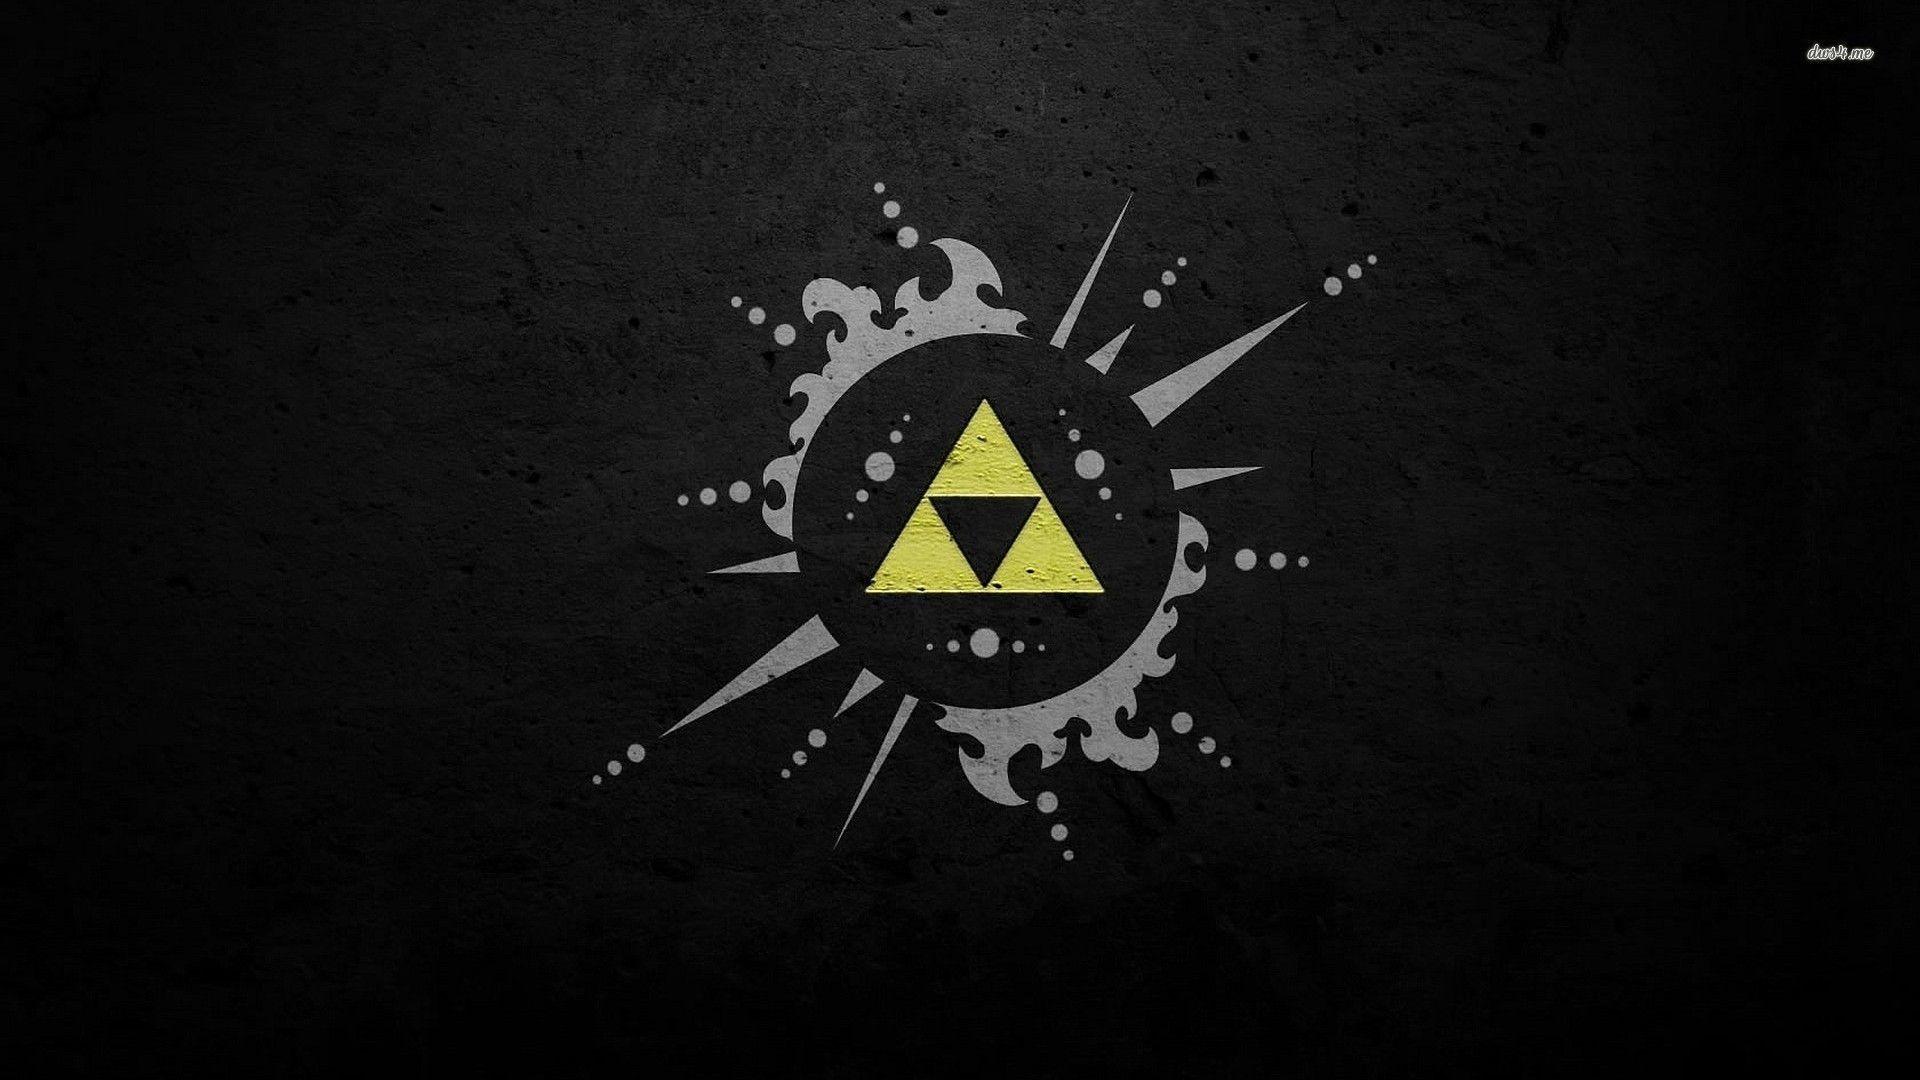 Epic Legend of Zelda Wallpaper 70 images 1920x1080